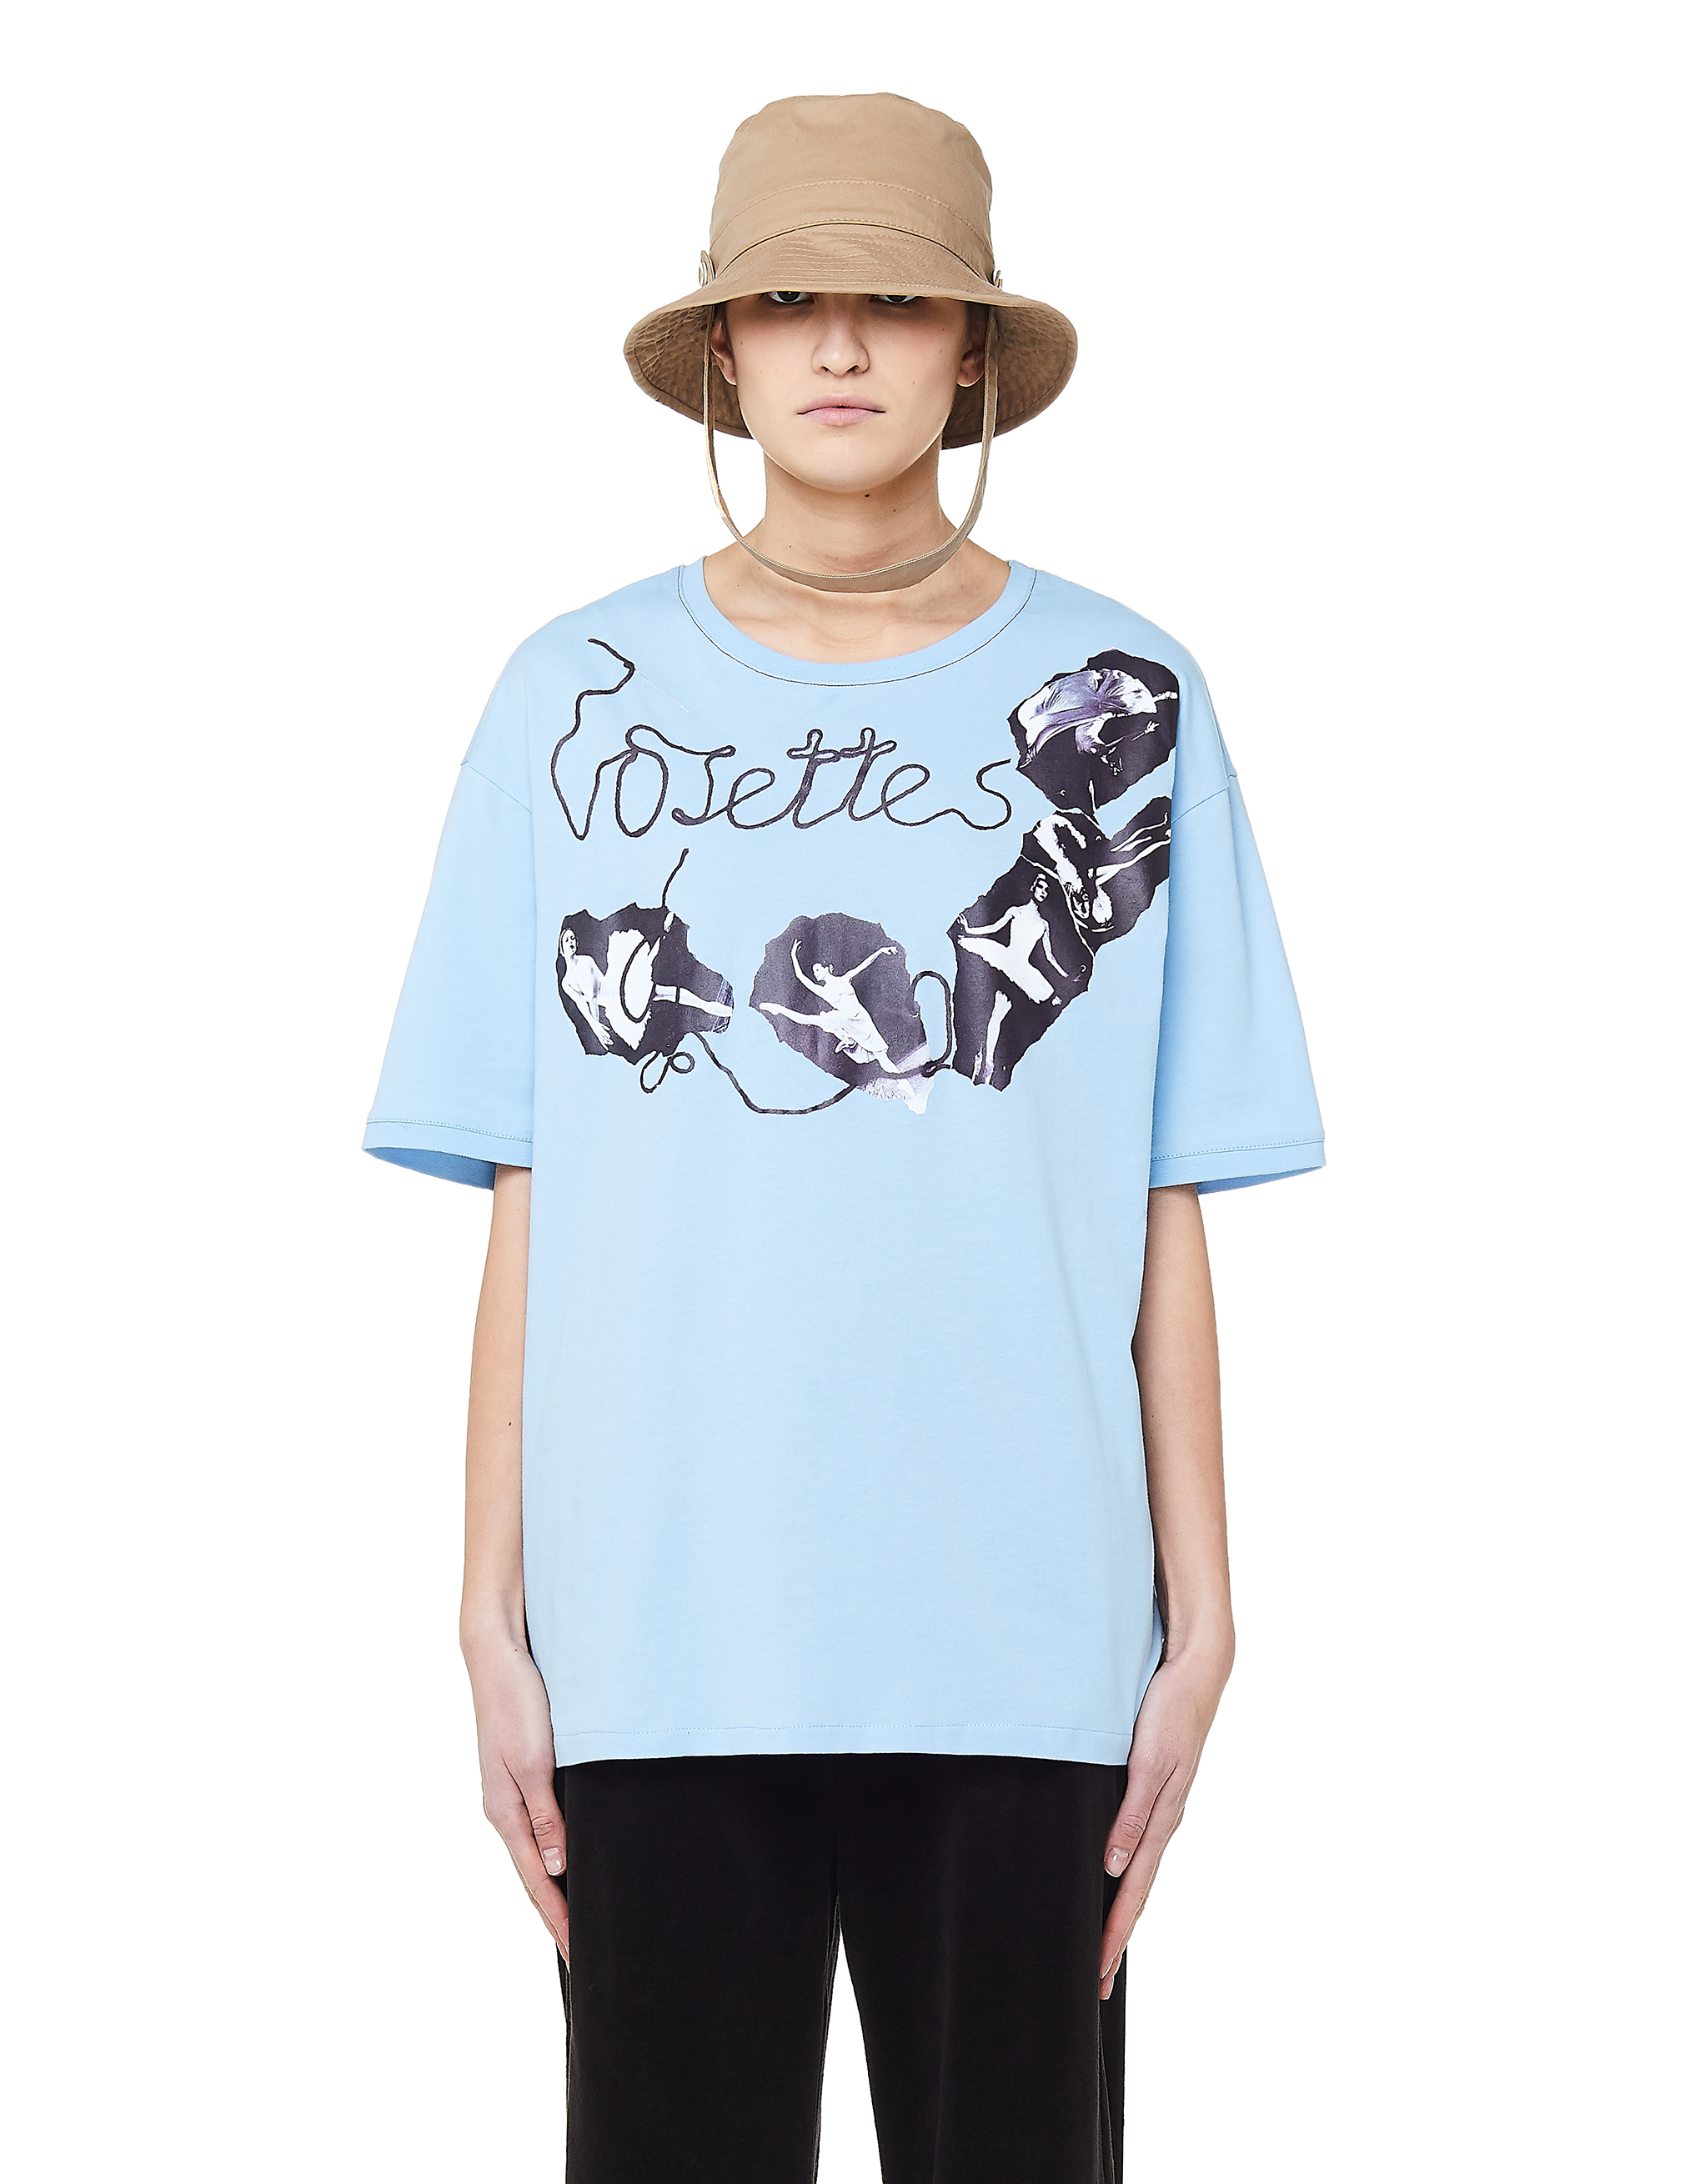 Vojettes Blue Cotton Ballerina Print T-Shirt